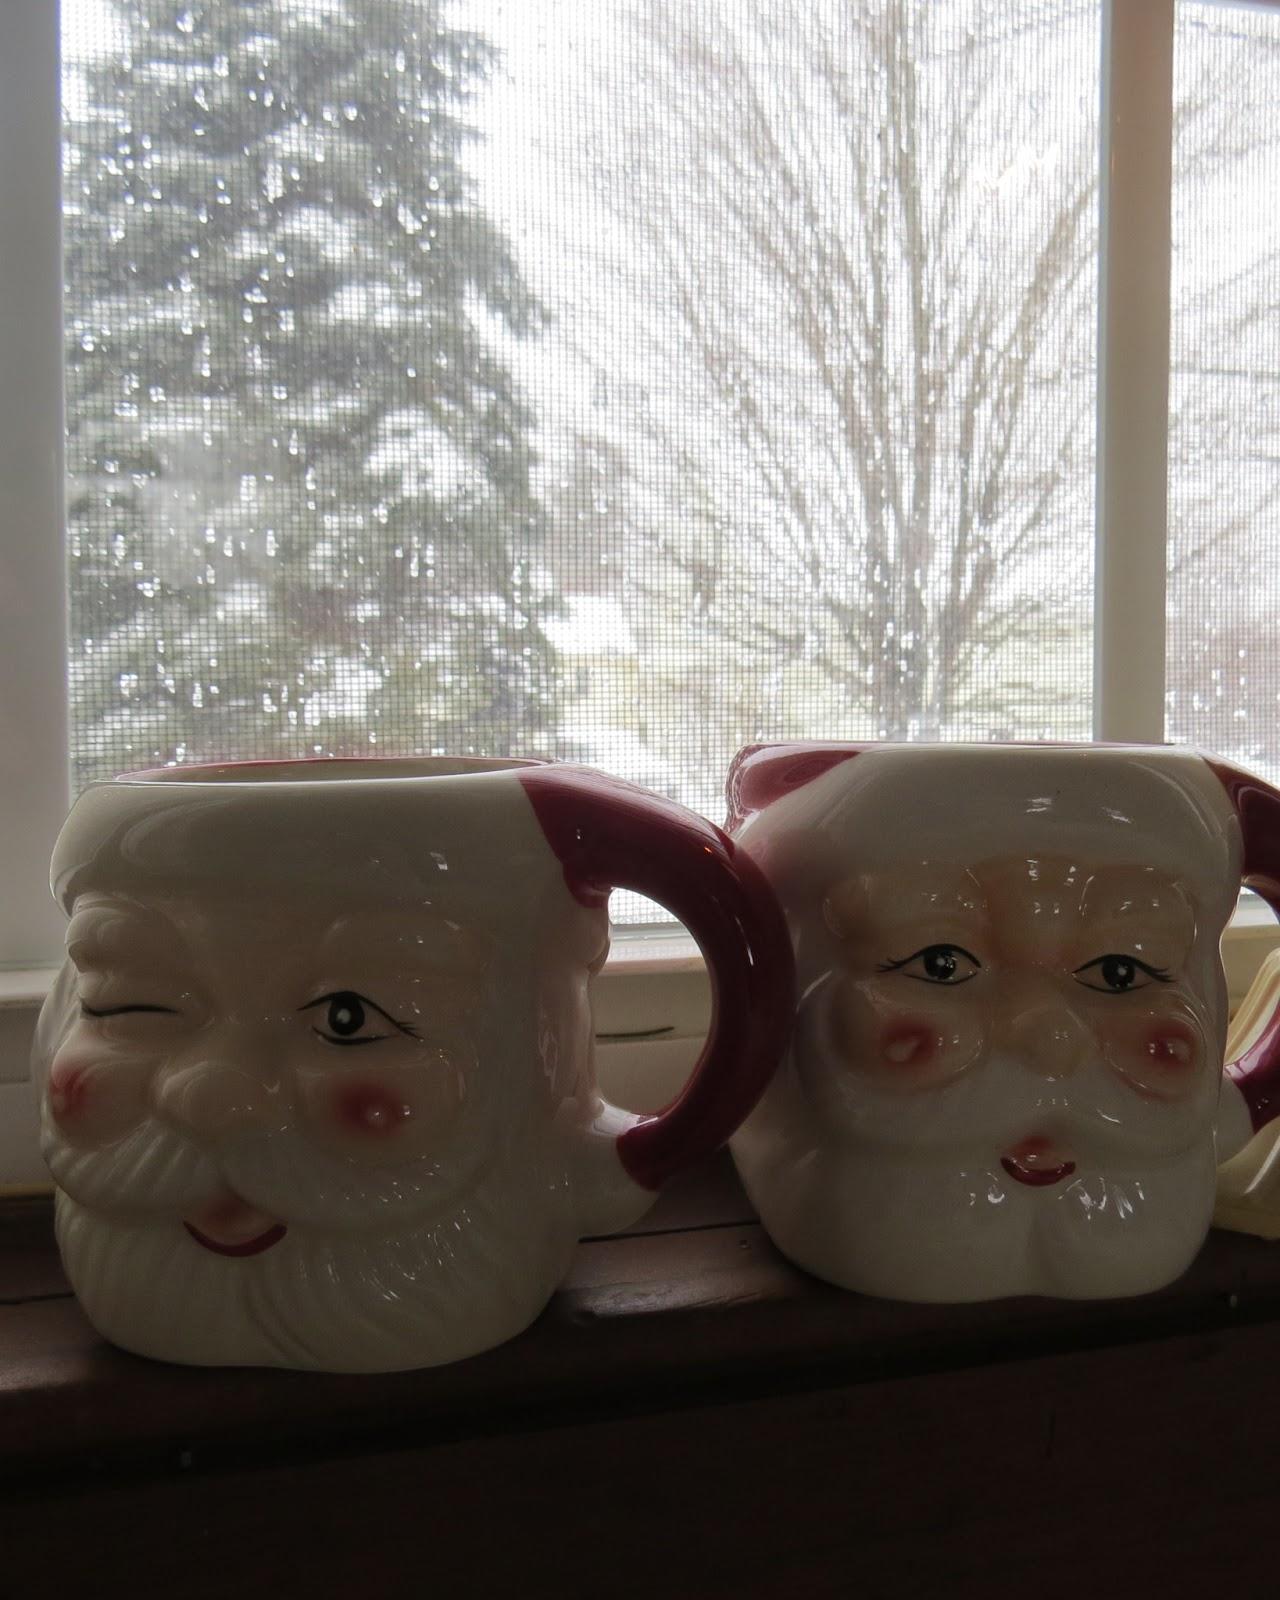 Good Cars For Snow: The Long Awaited Home: Good-bye Christmas 2012